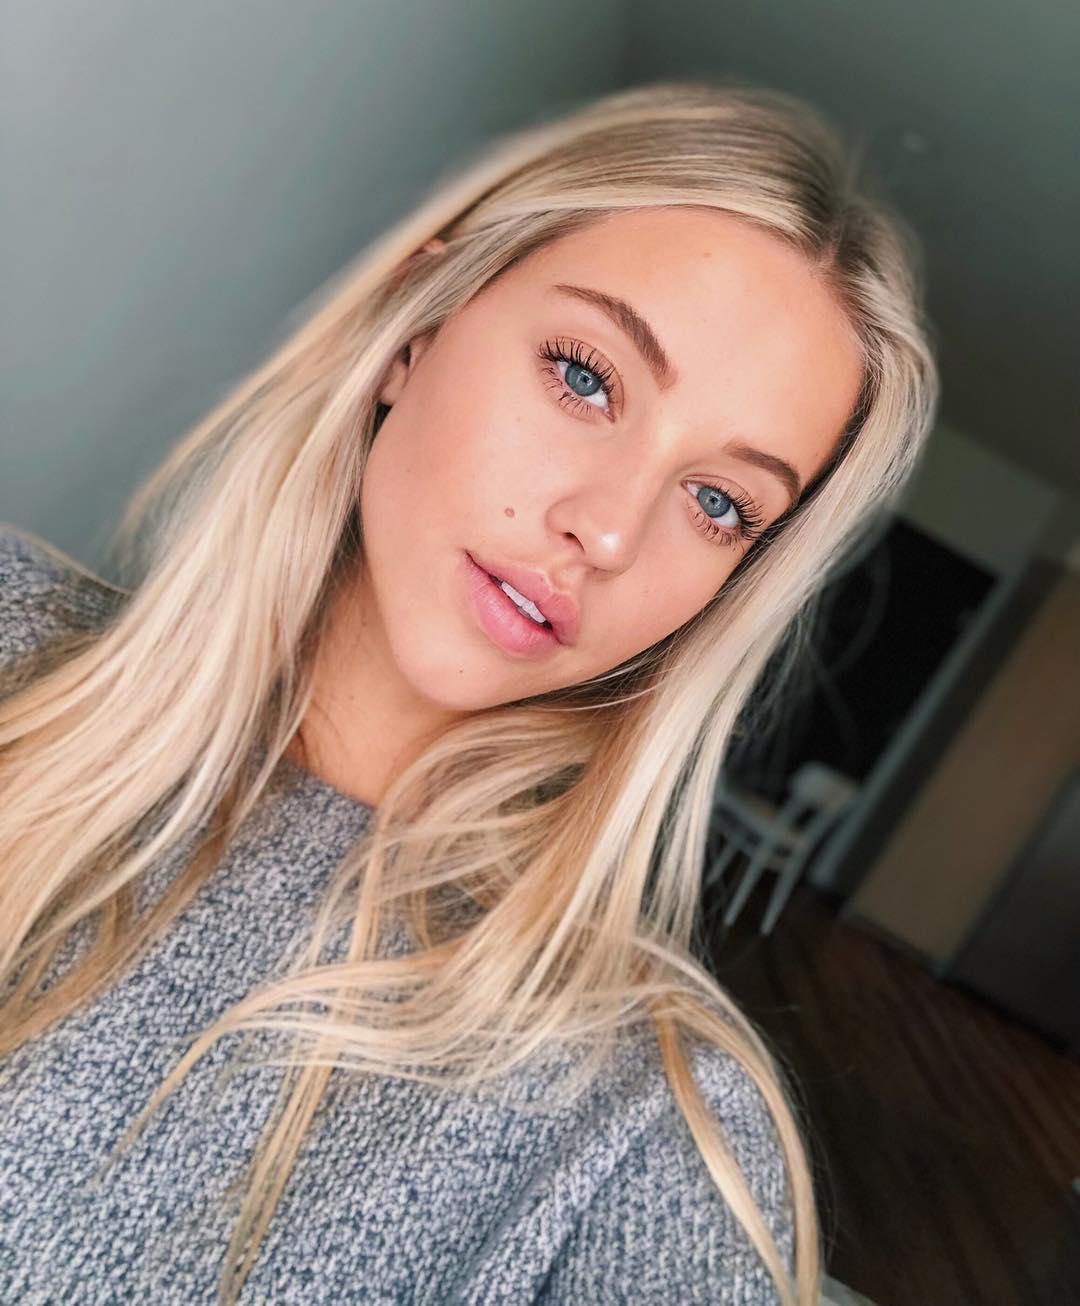 Kaitlynn-Bell-5